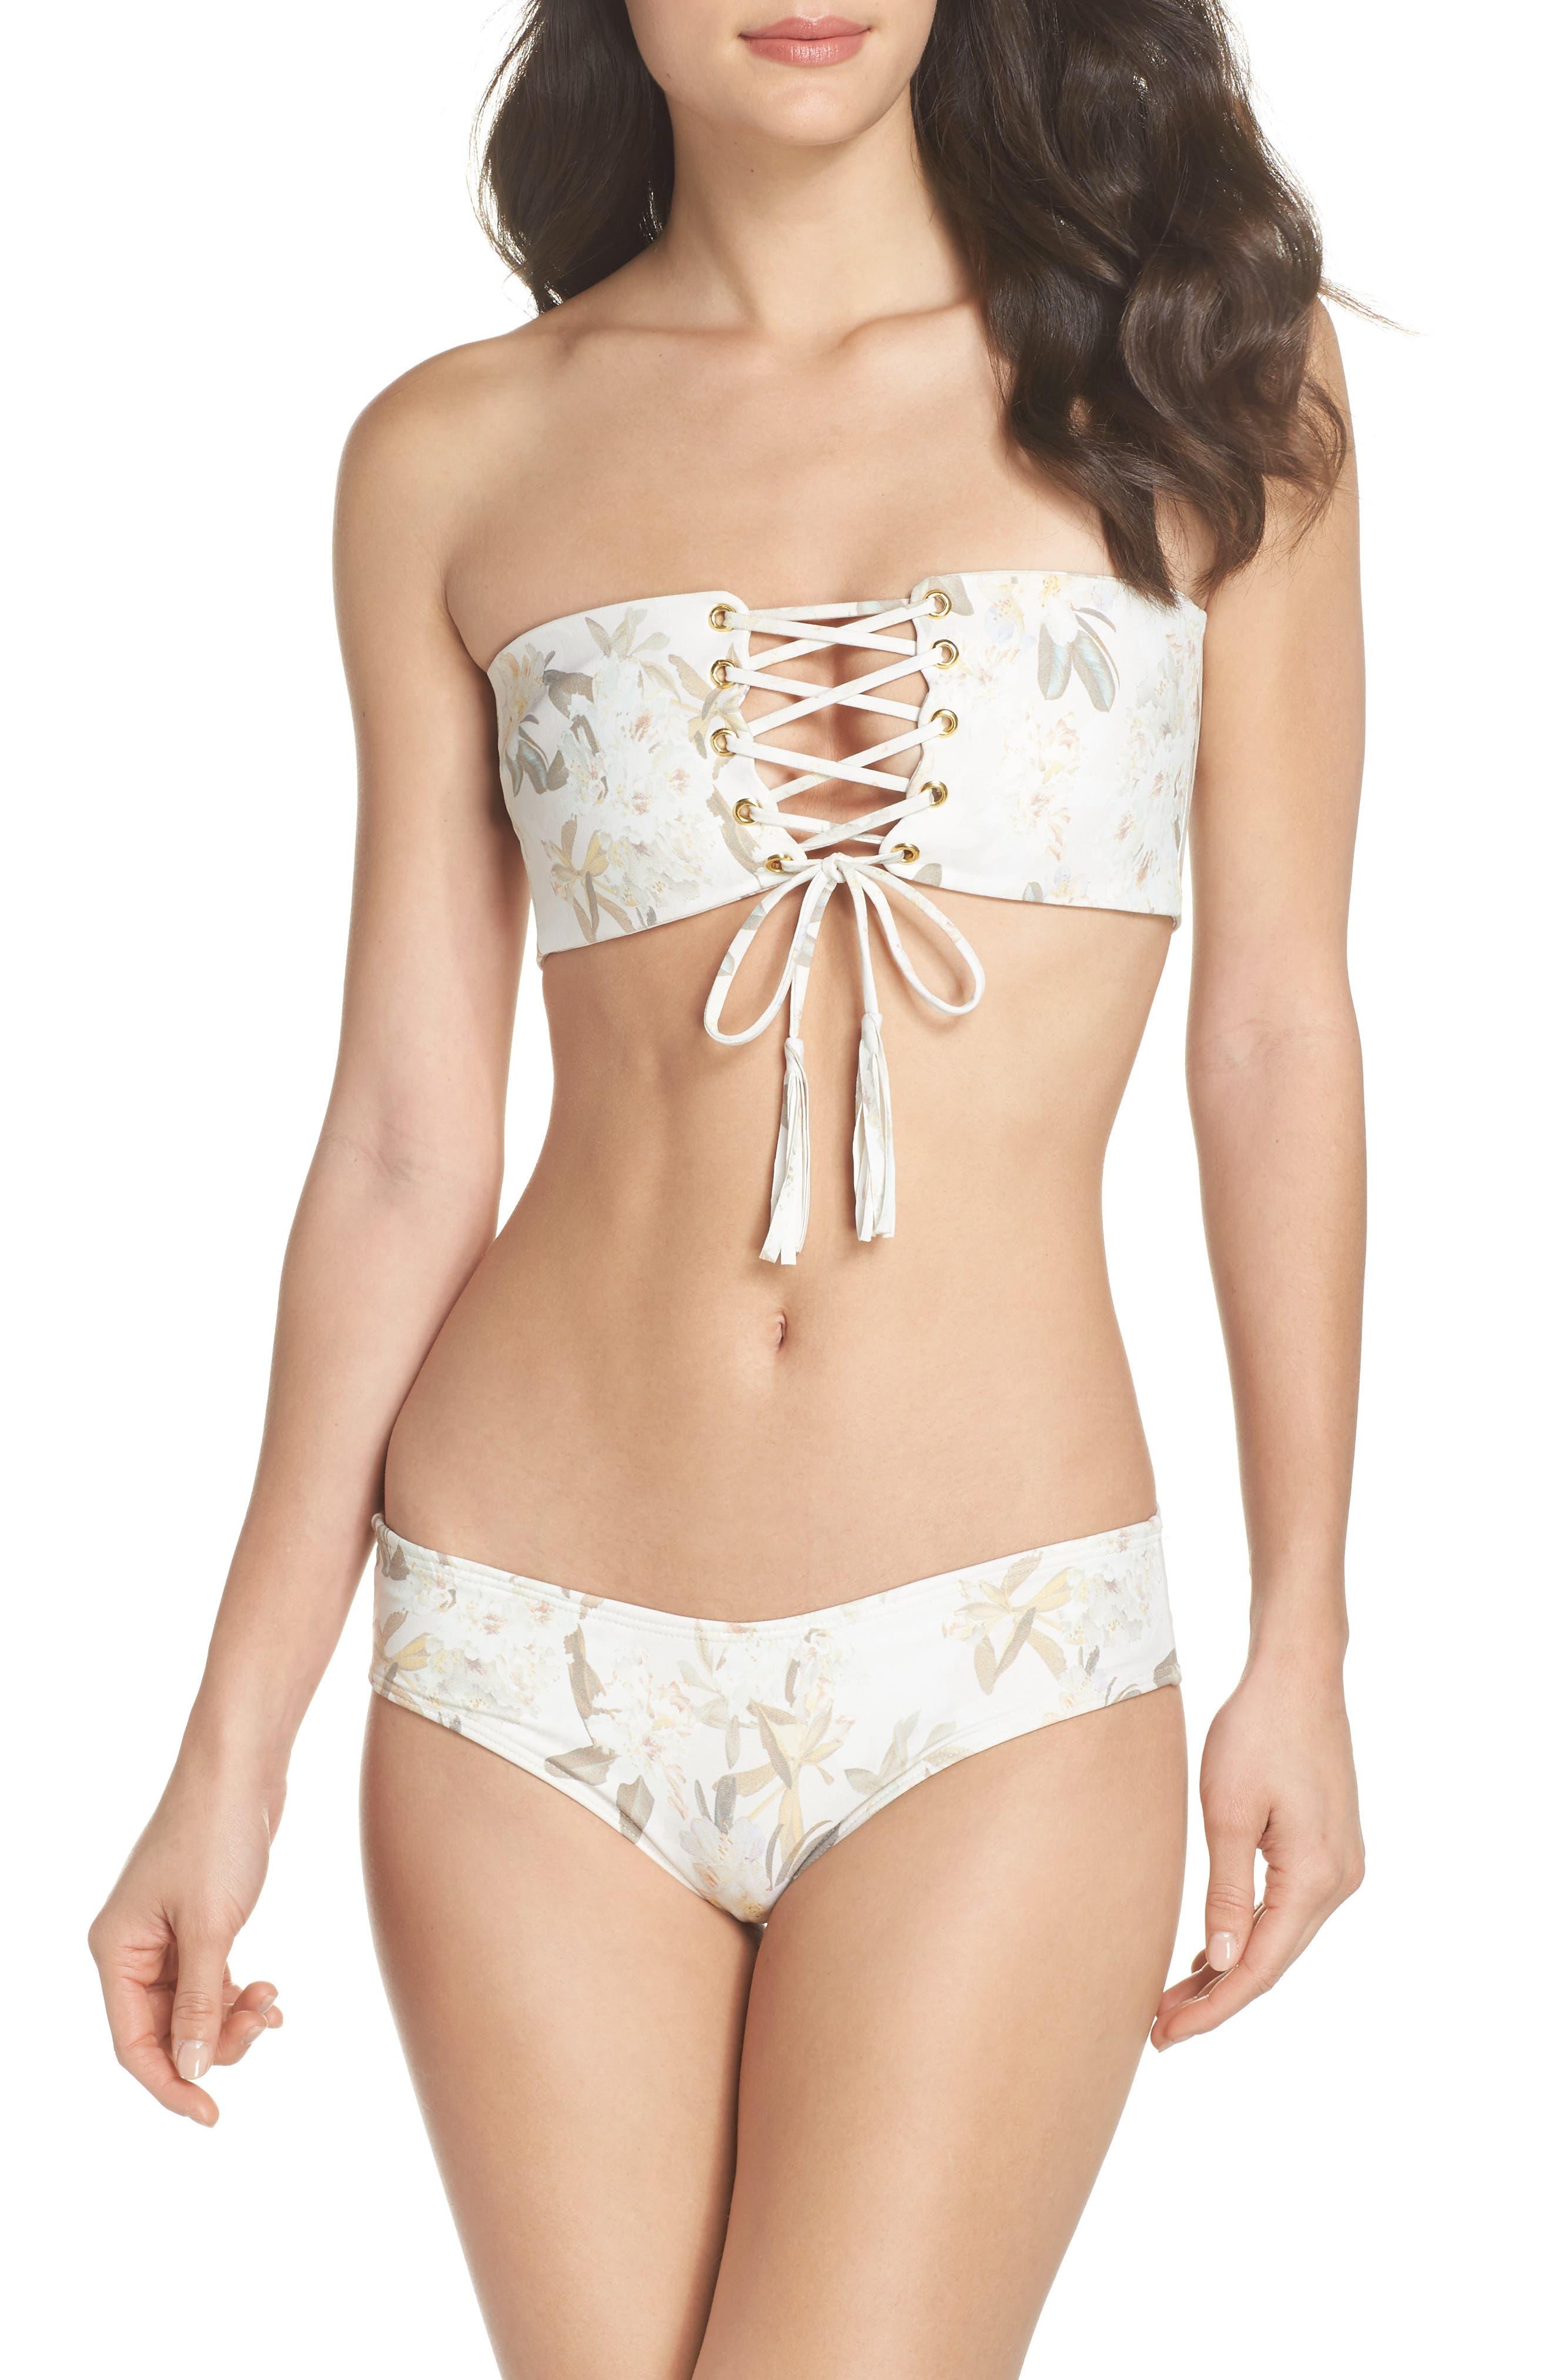 AC Nu Micro Bikini Bottoms,                             Alternate thumbnail 5, color,                             Ete Floral White